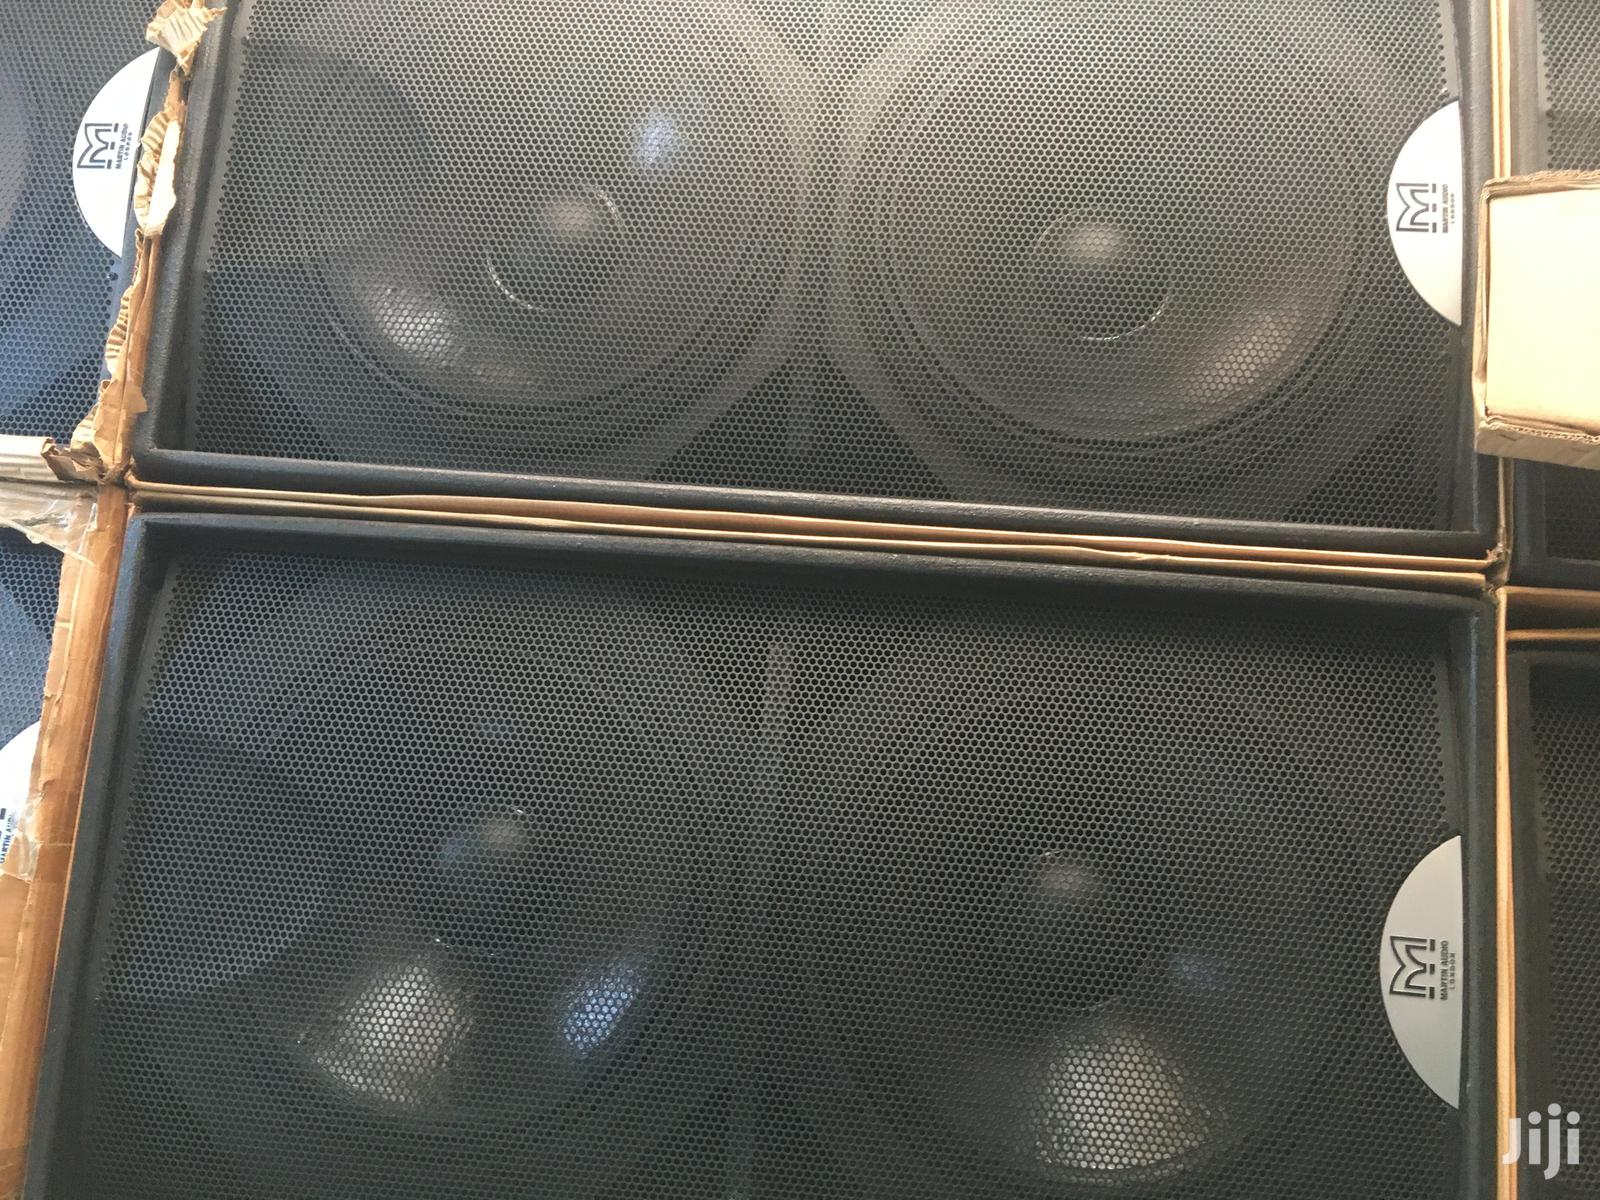 Martin Audio Bass Speakers | Audio & Music Equipment for sale in Kampala, Central Region, Uganda